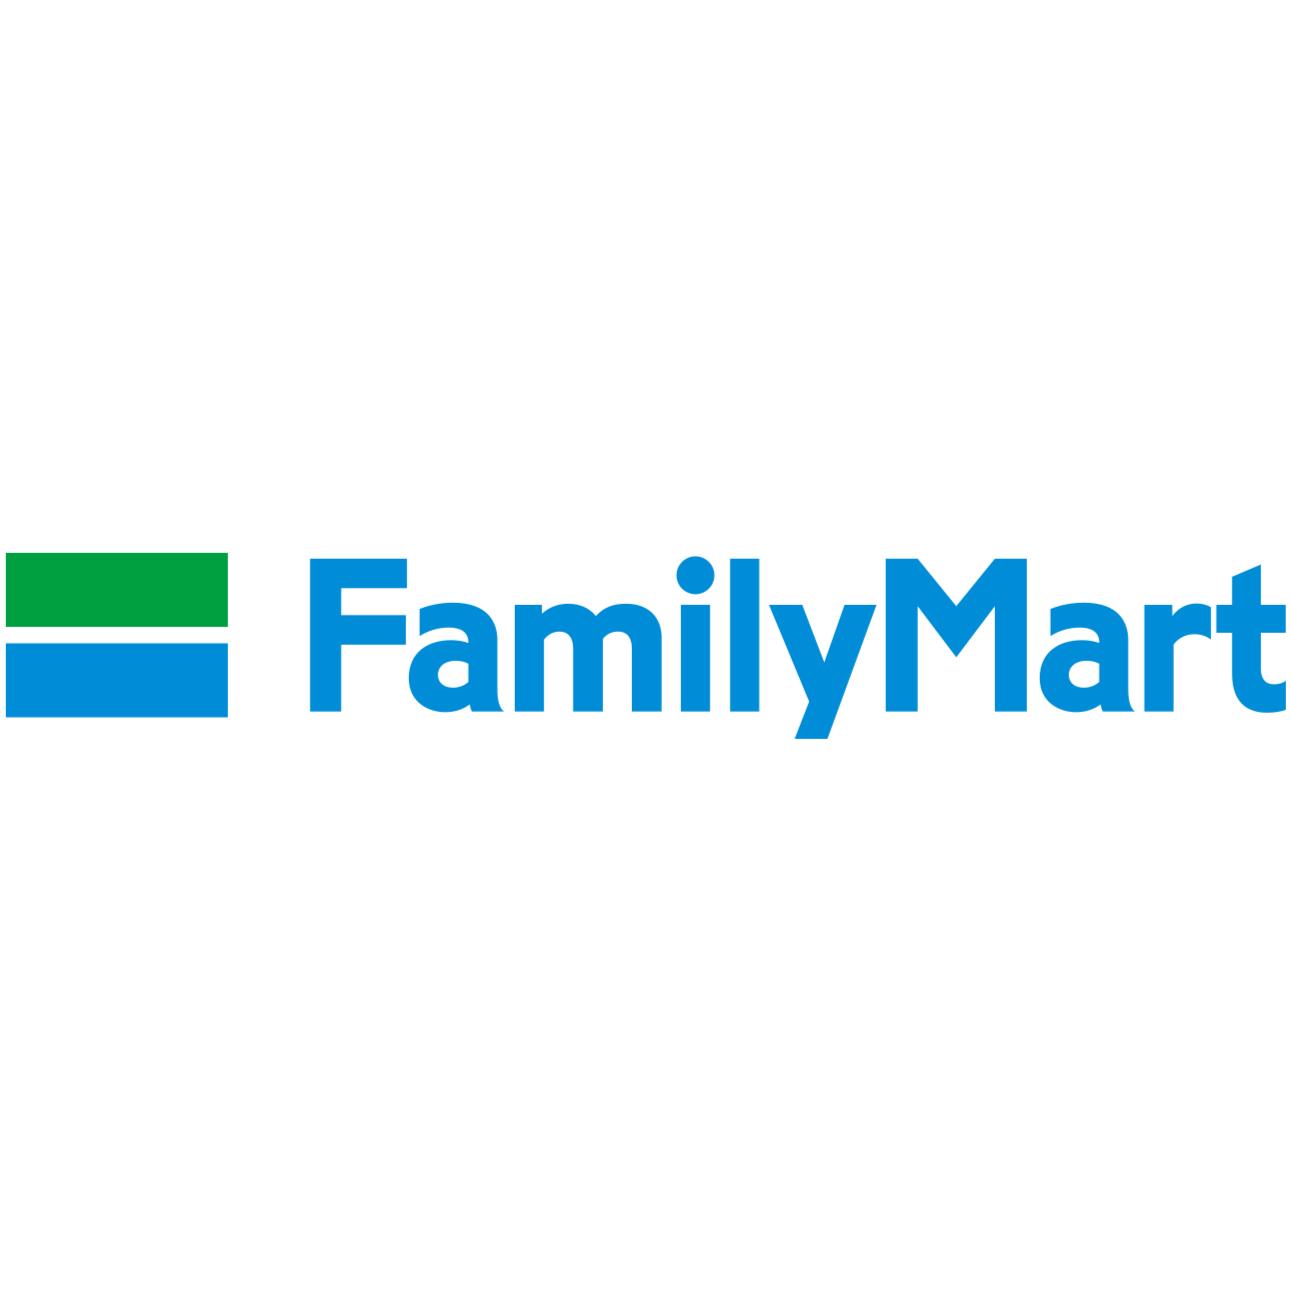 Philippine FamilyMart CVS, Inc. logo